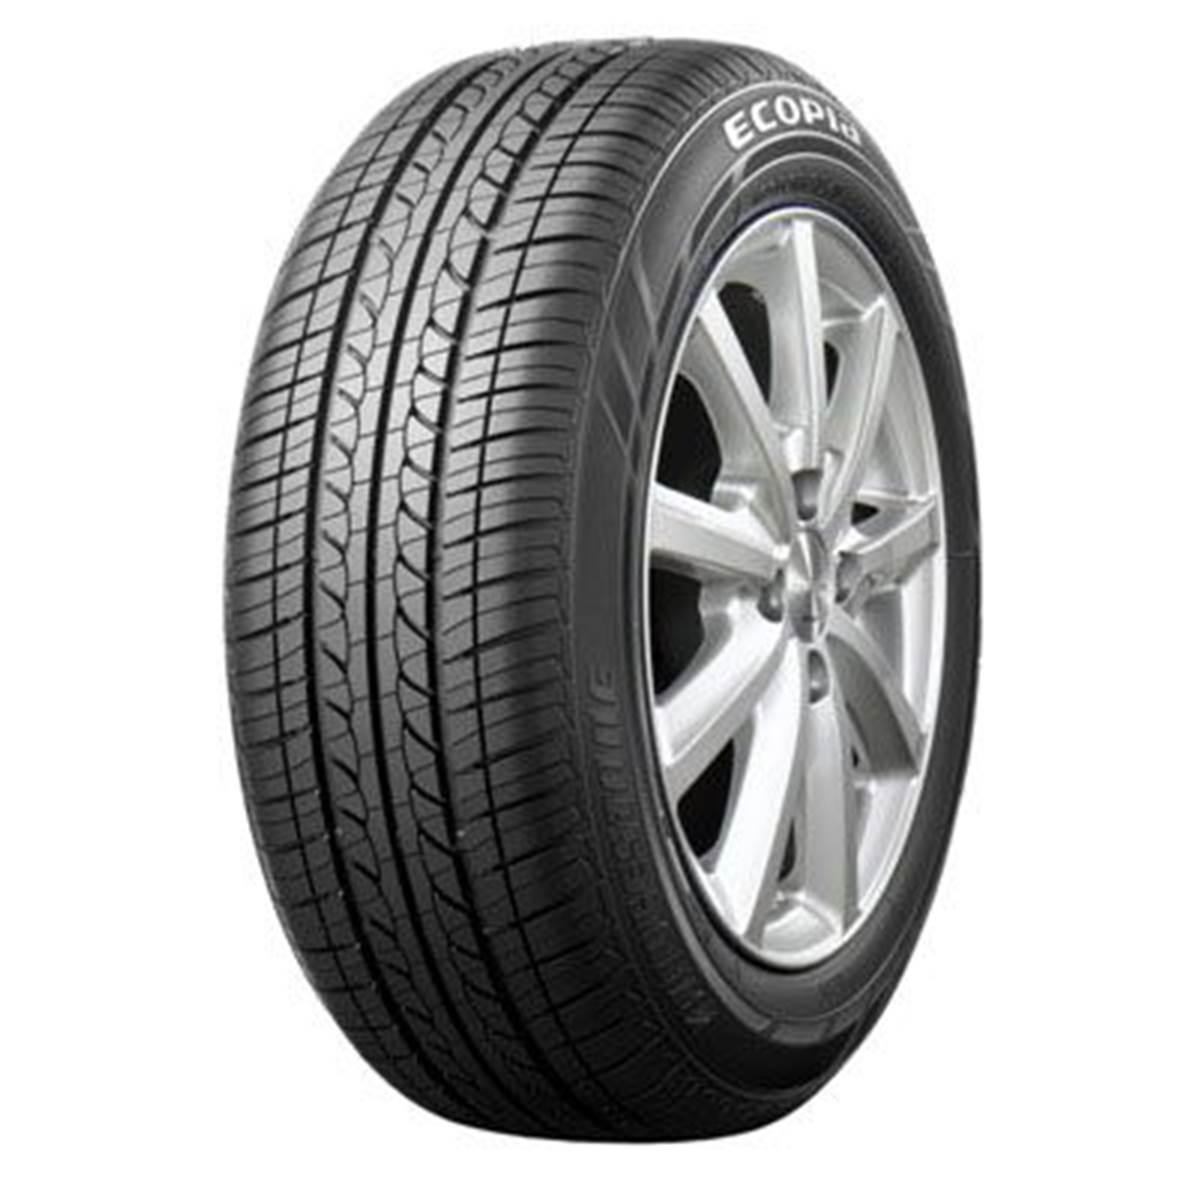 Pneu Bridgestone 175/65R15 84H Ecopia Ep25